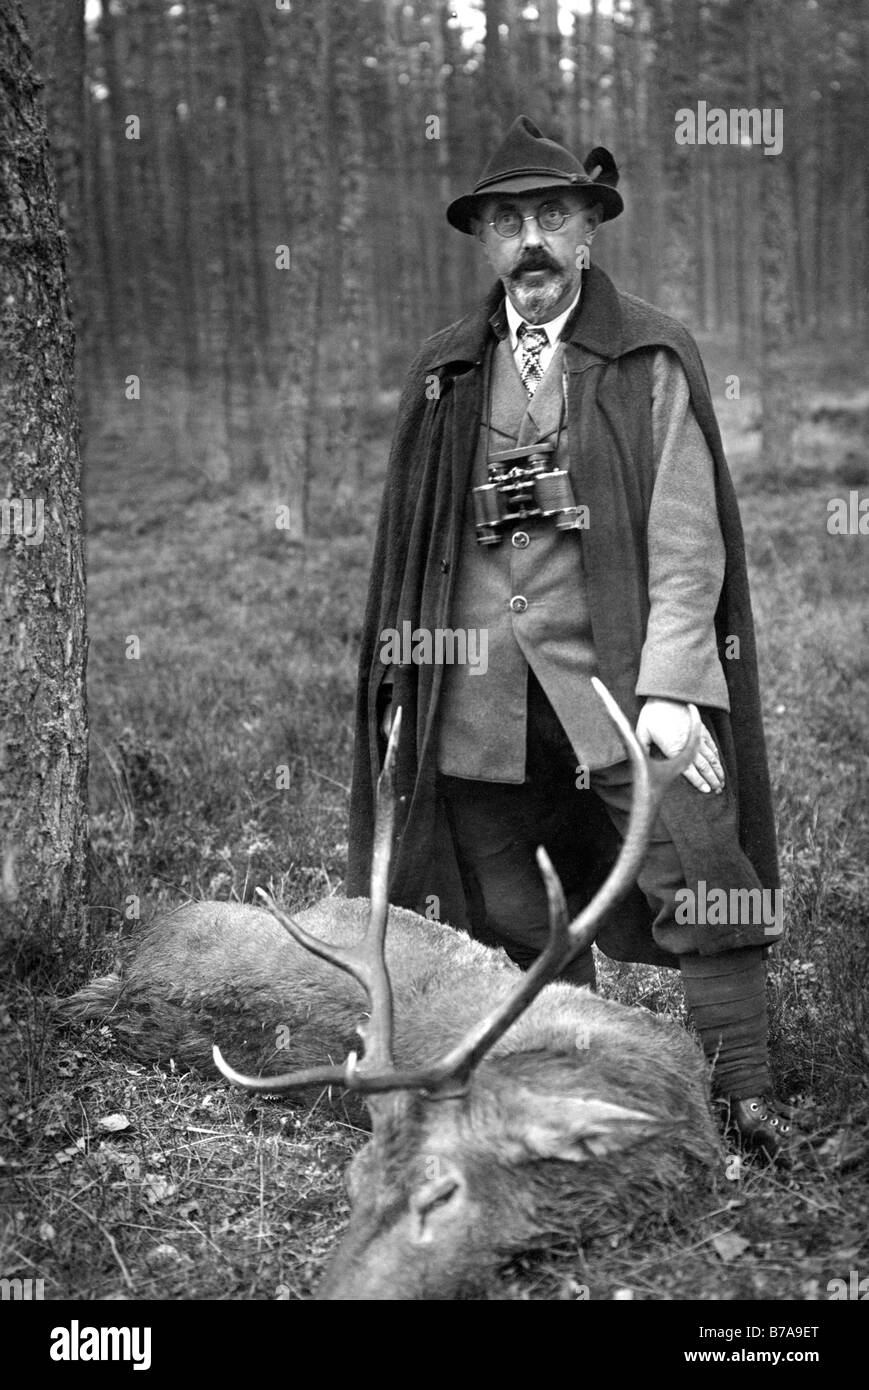 Historic photo, hunter with killed deer, ca. 1920 Stock Photo